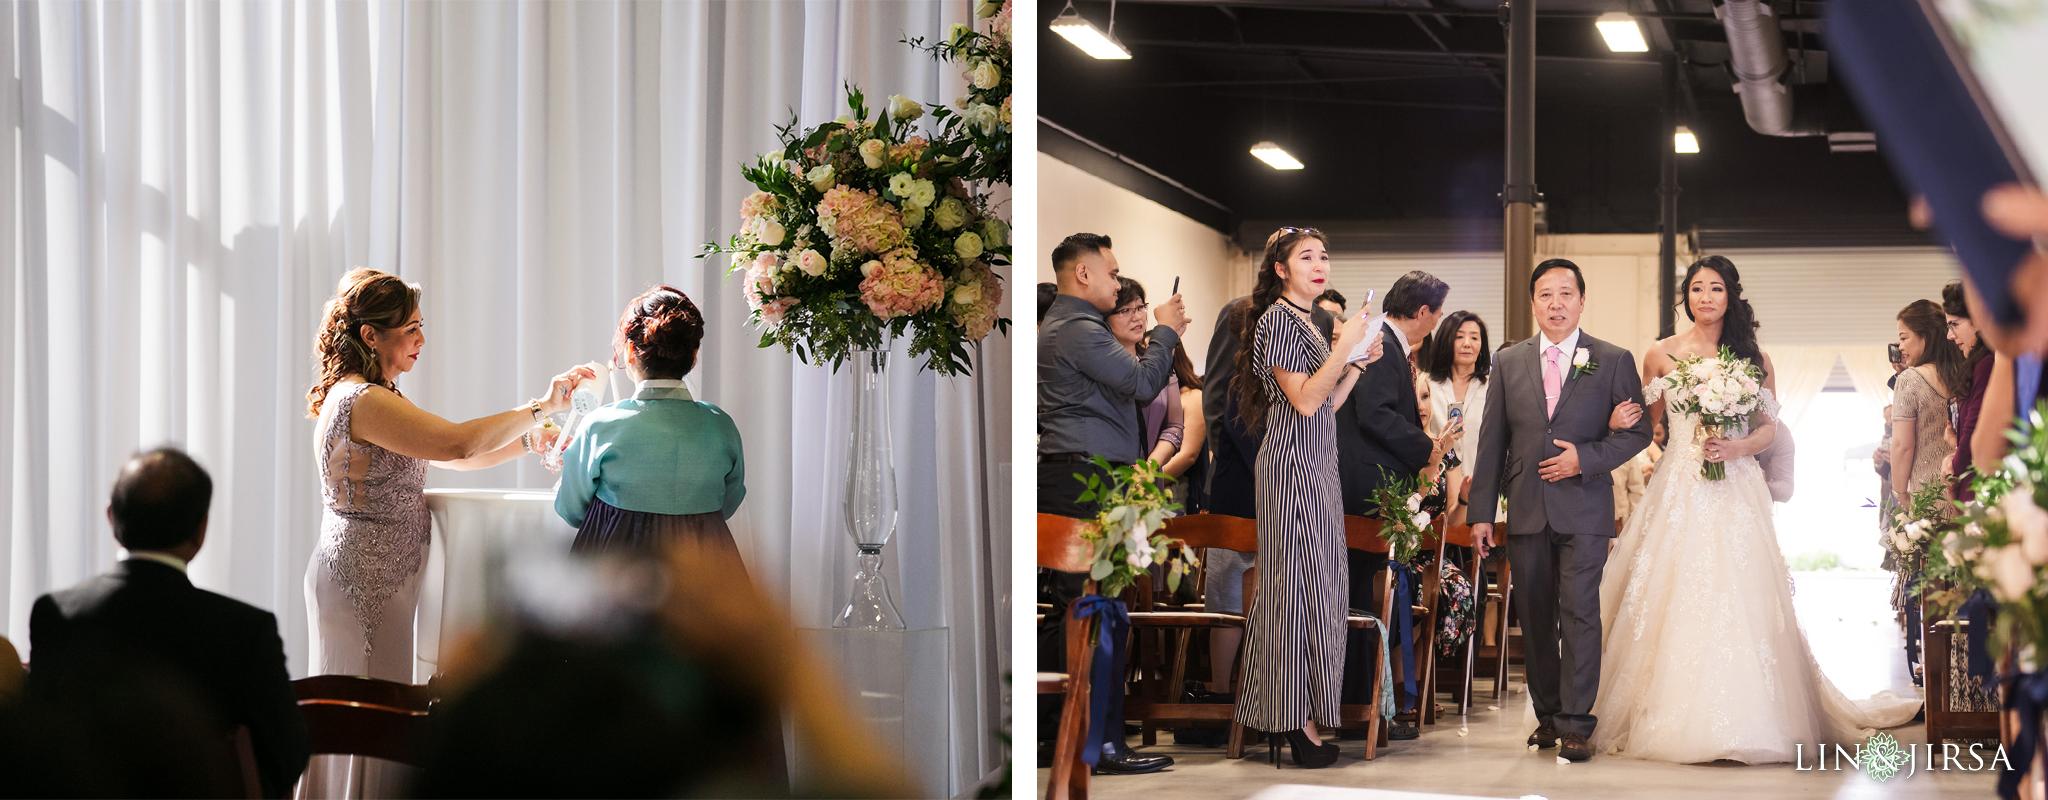 17 Business Expo Center Orange County Korean Filipino Wedding Photography